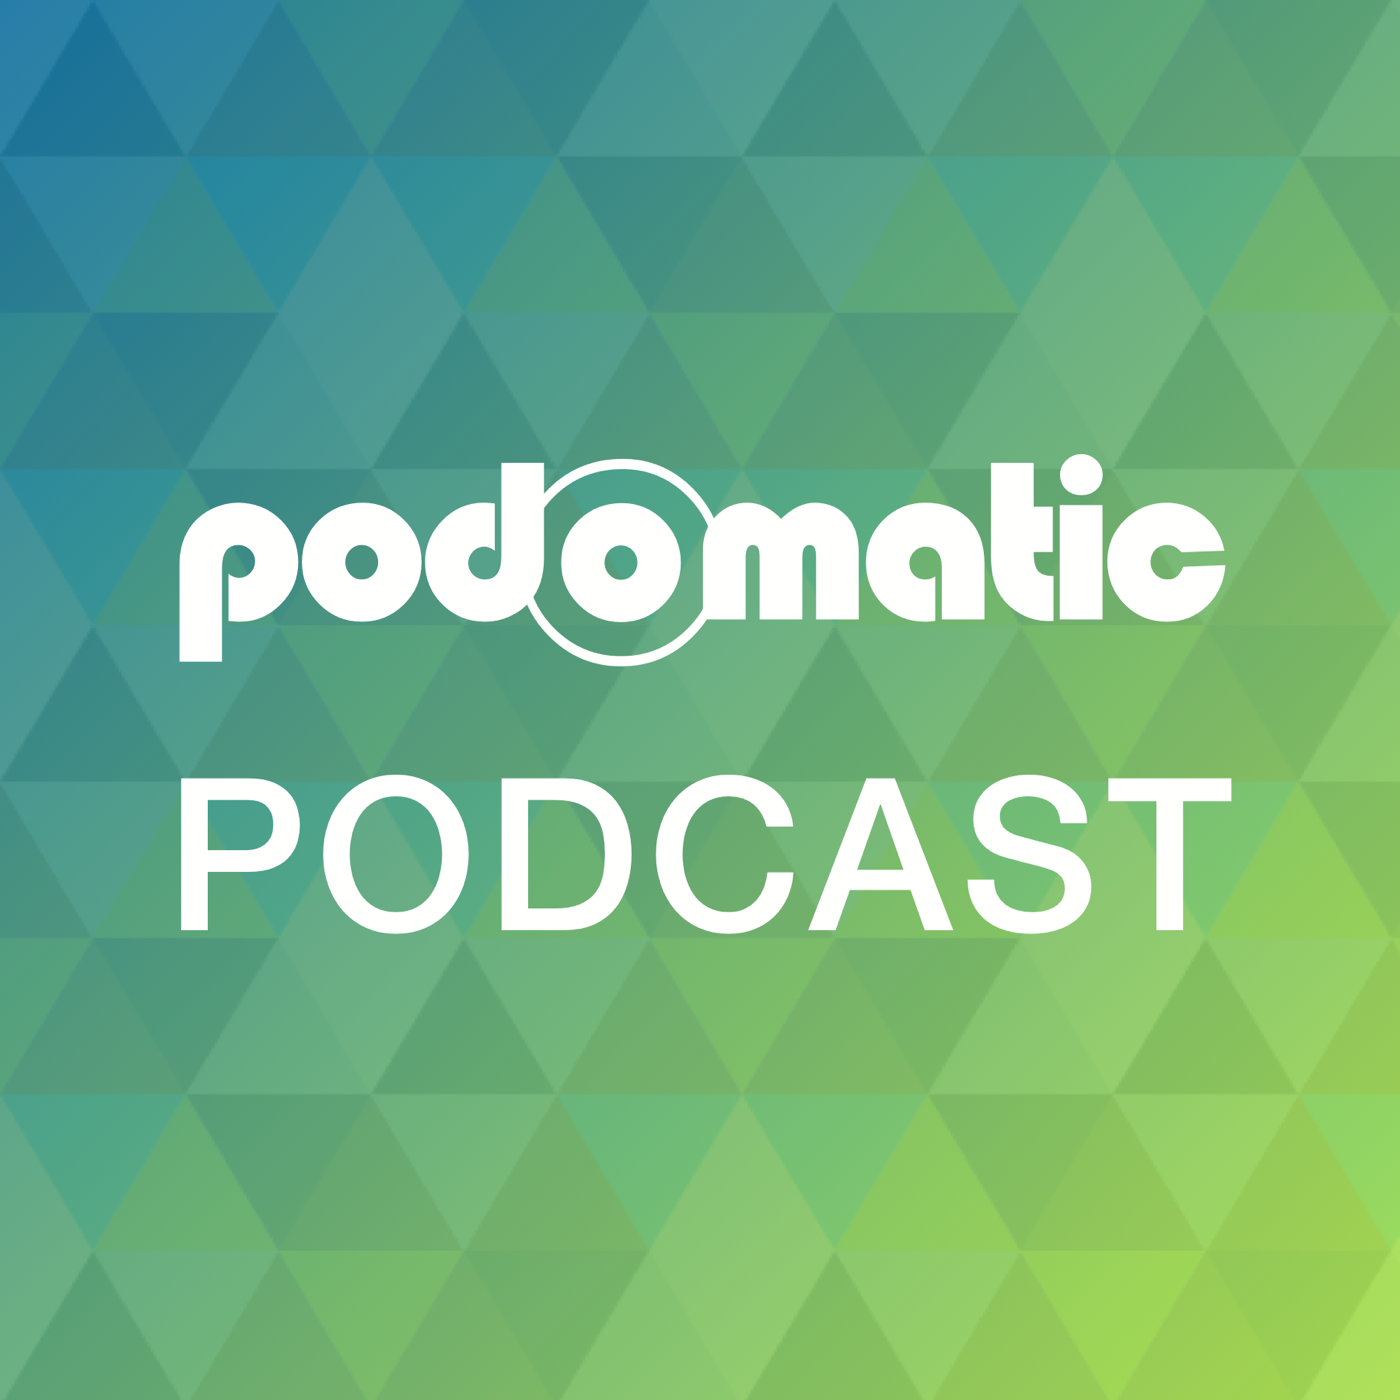 Brandon Reeve's Podcast